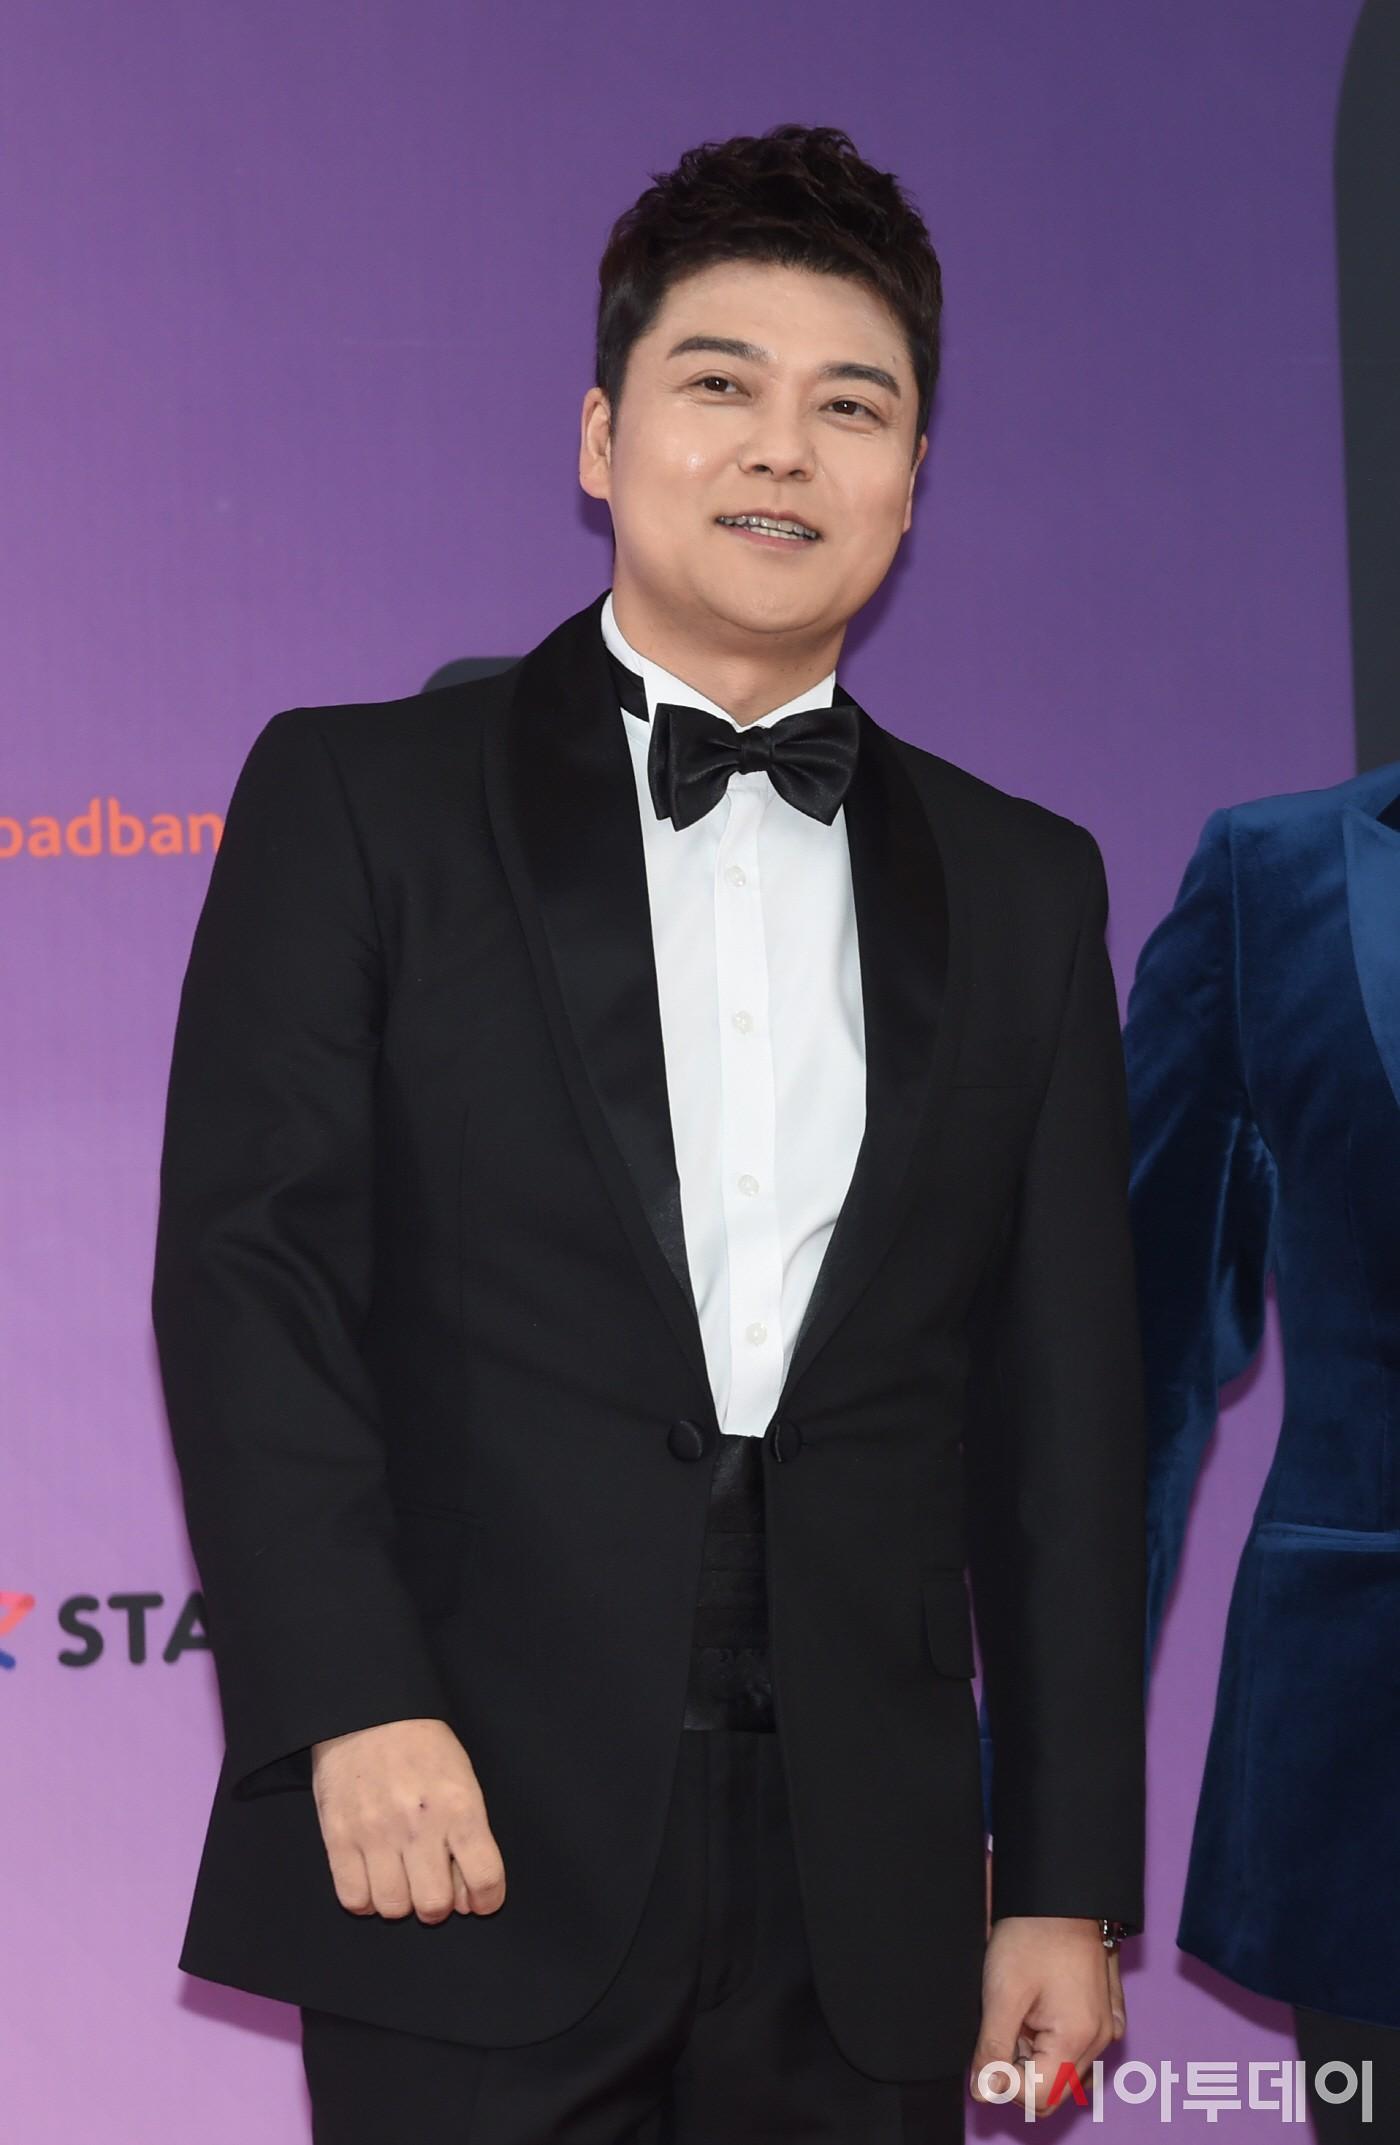 red-velvet-joy-jun-hyun-moo-host-brand-new-idol-dog-competition-chuseok-2